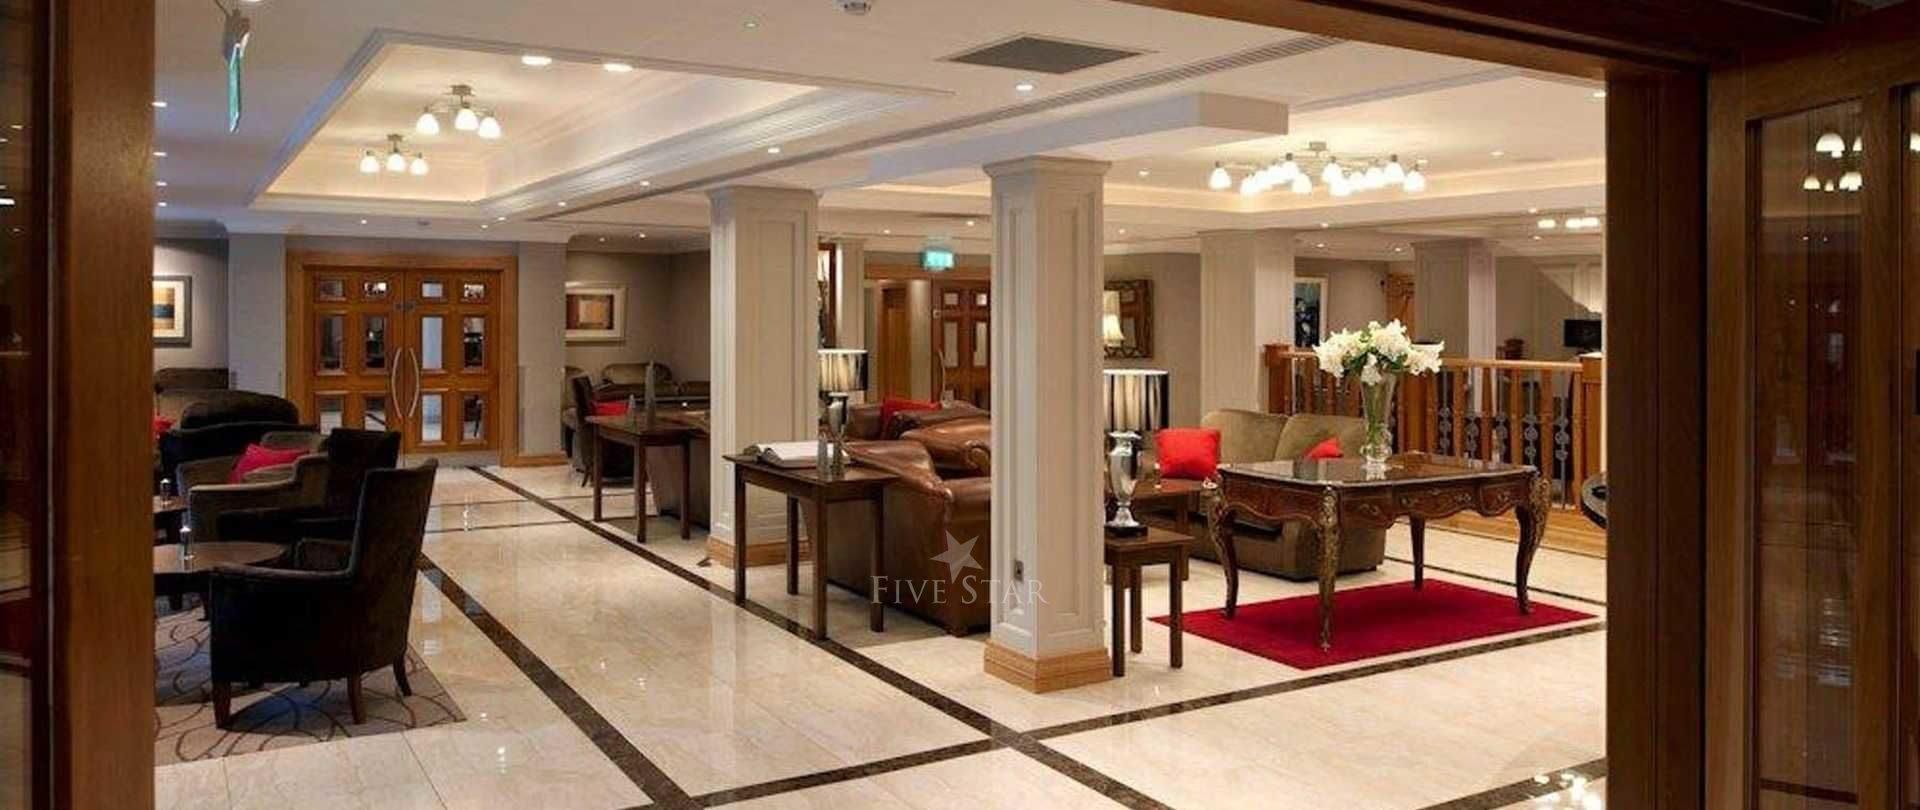 Malone Lodge Hotel & Apartments photo 2